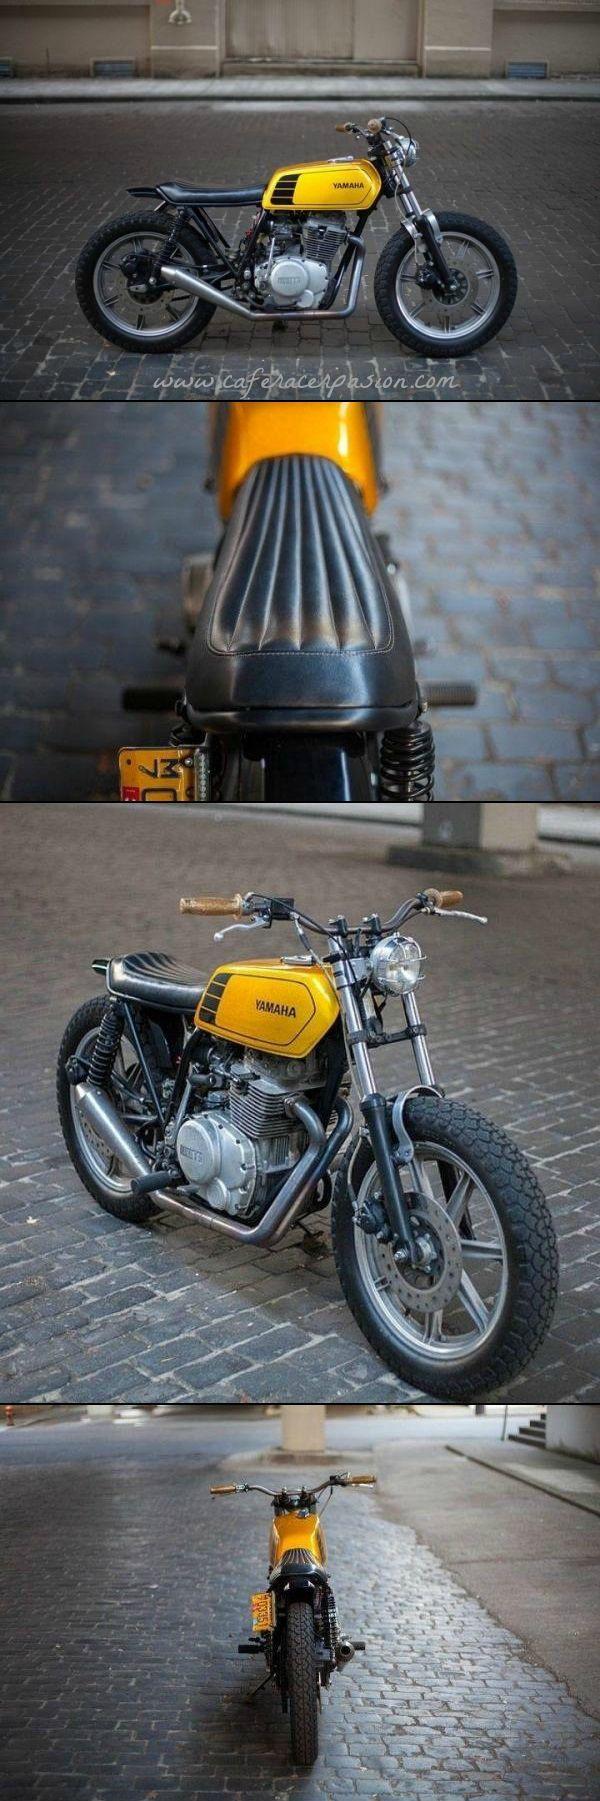 Yamaha XS400 Street Tracker by New Church Moto #motorcycles #streettracker #motos | caferacerpasion.com